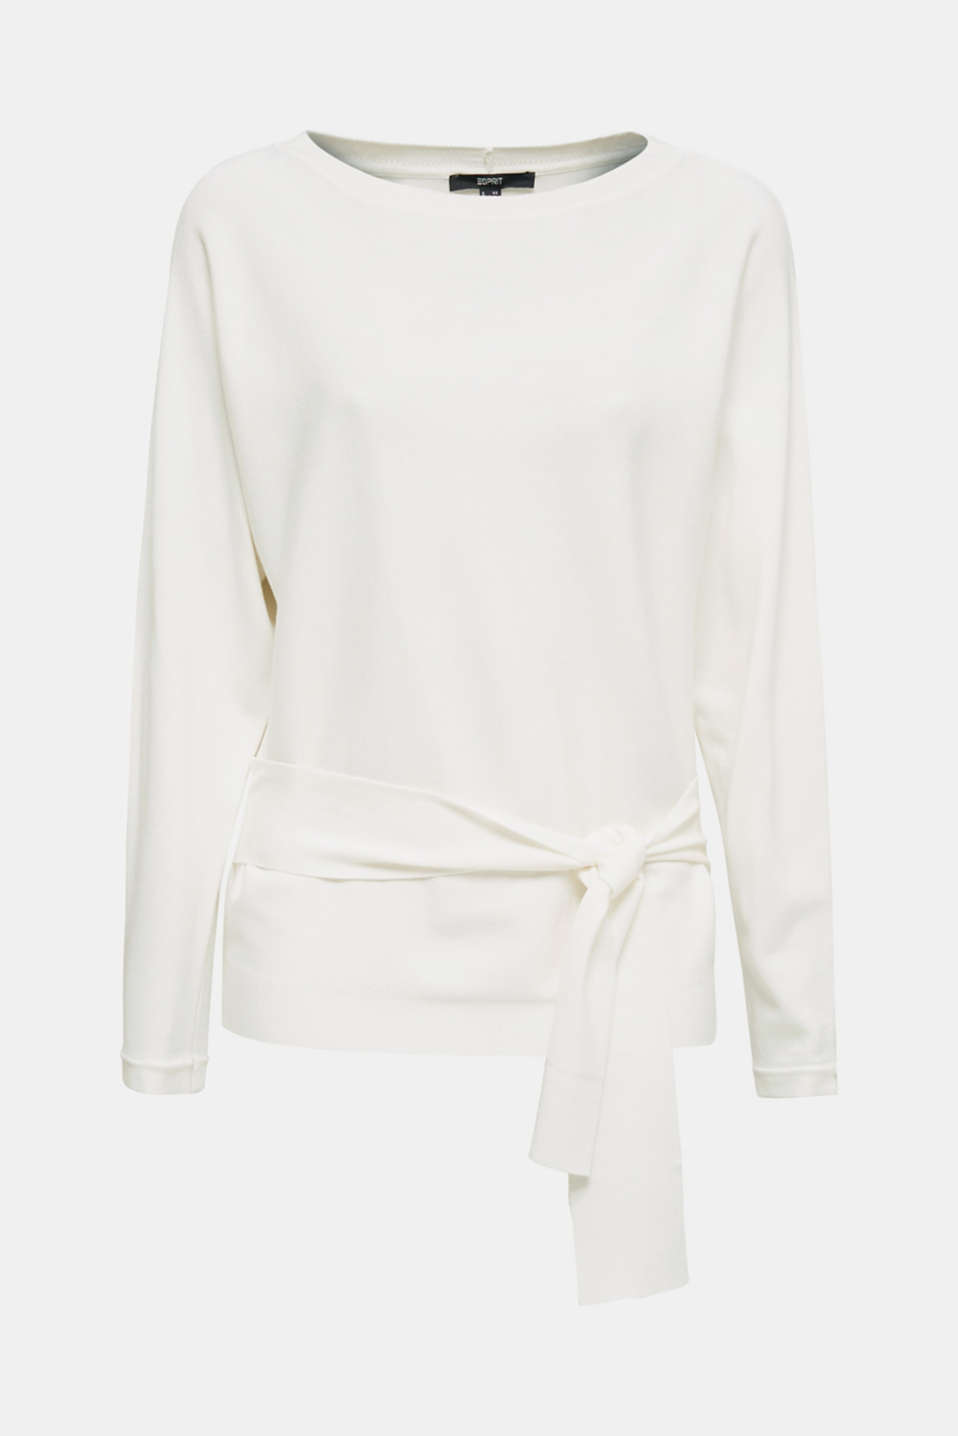 Jumper with tie-around belt, OFF WHITE, detail image number 8